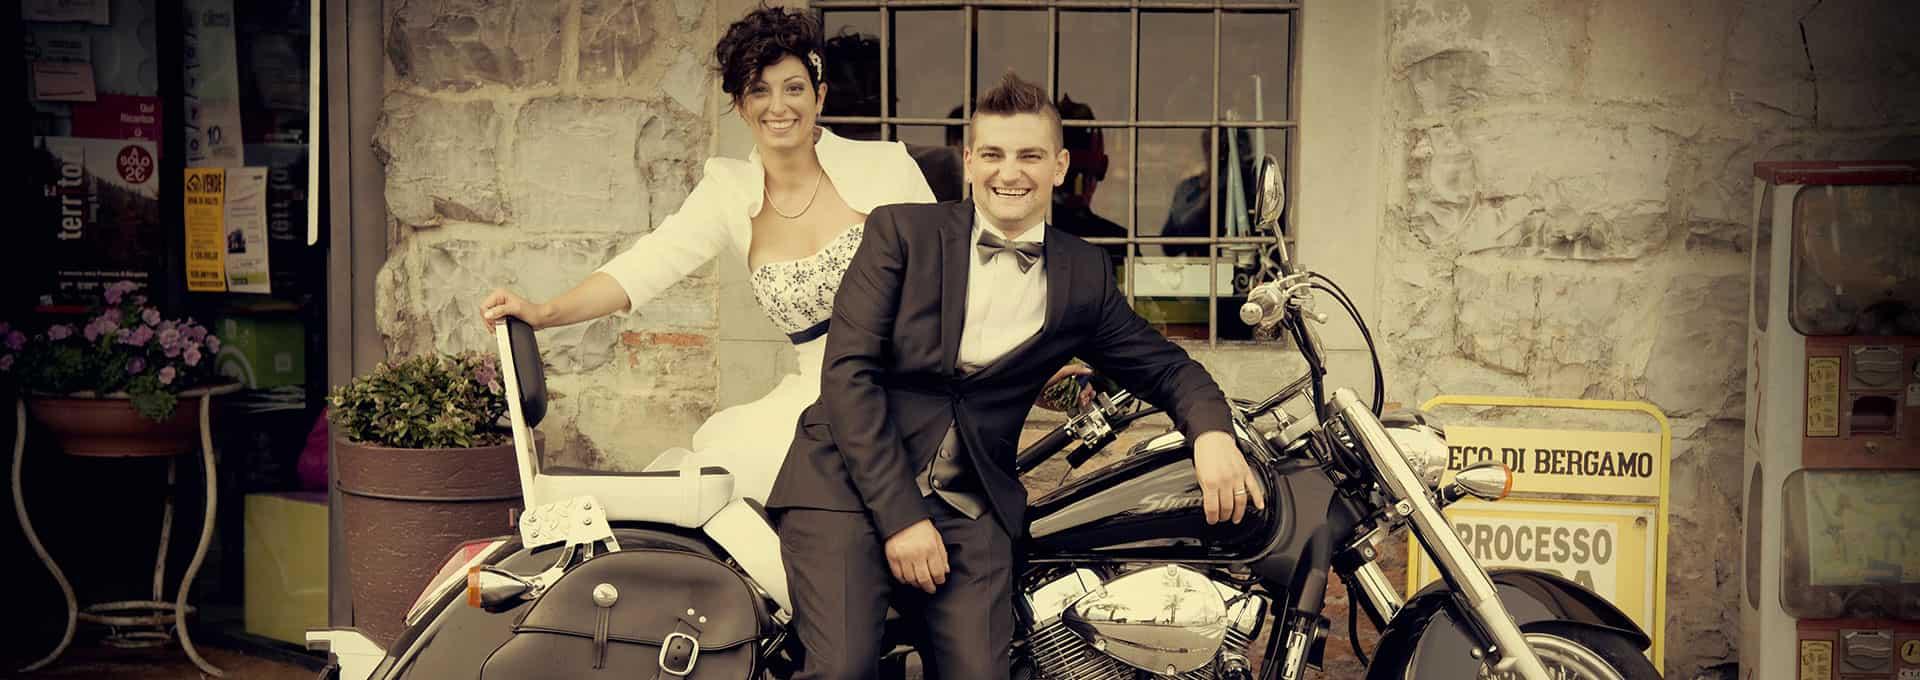 Matrimoni Studio fotografico Tarzia